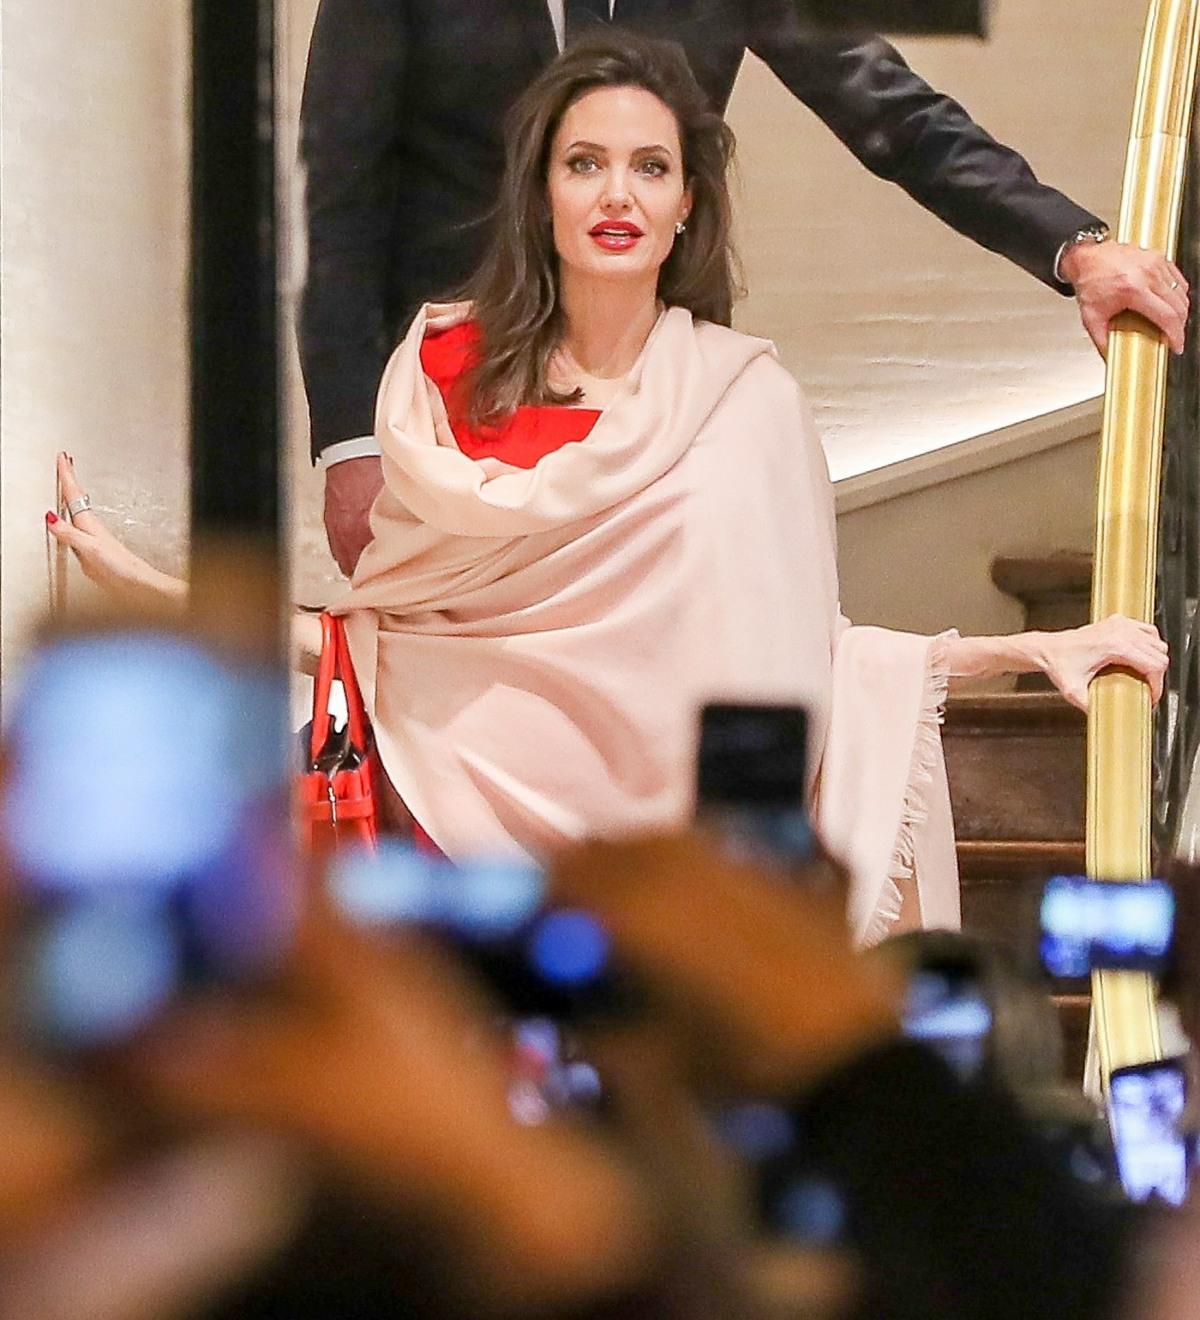 Angelina Jolie leaving Guerlain HQ looking flawless!